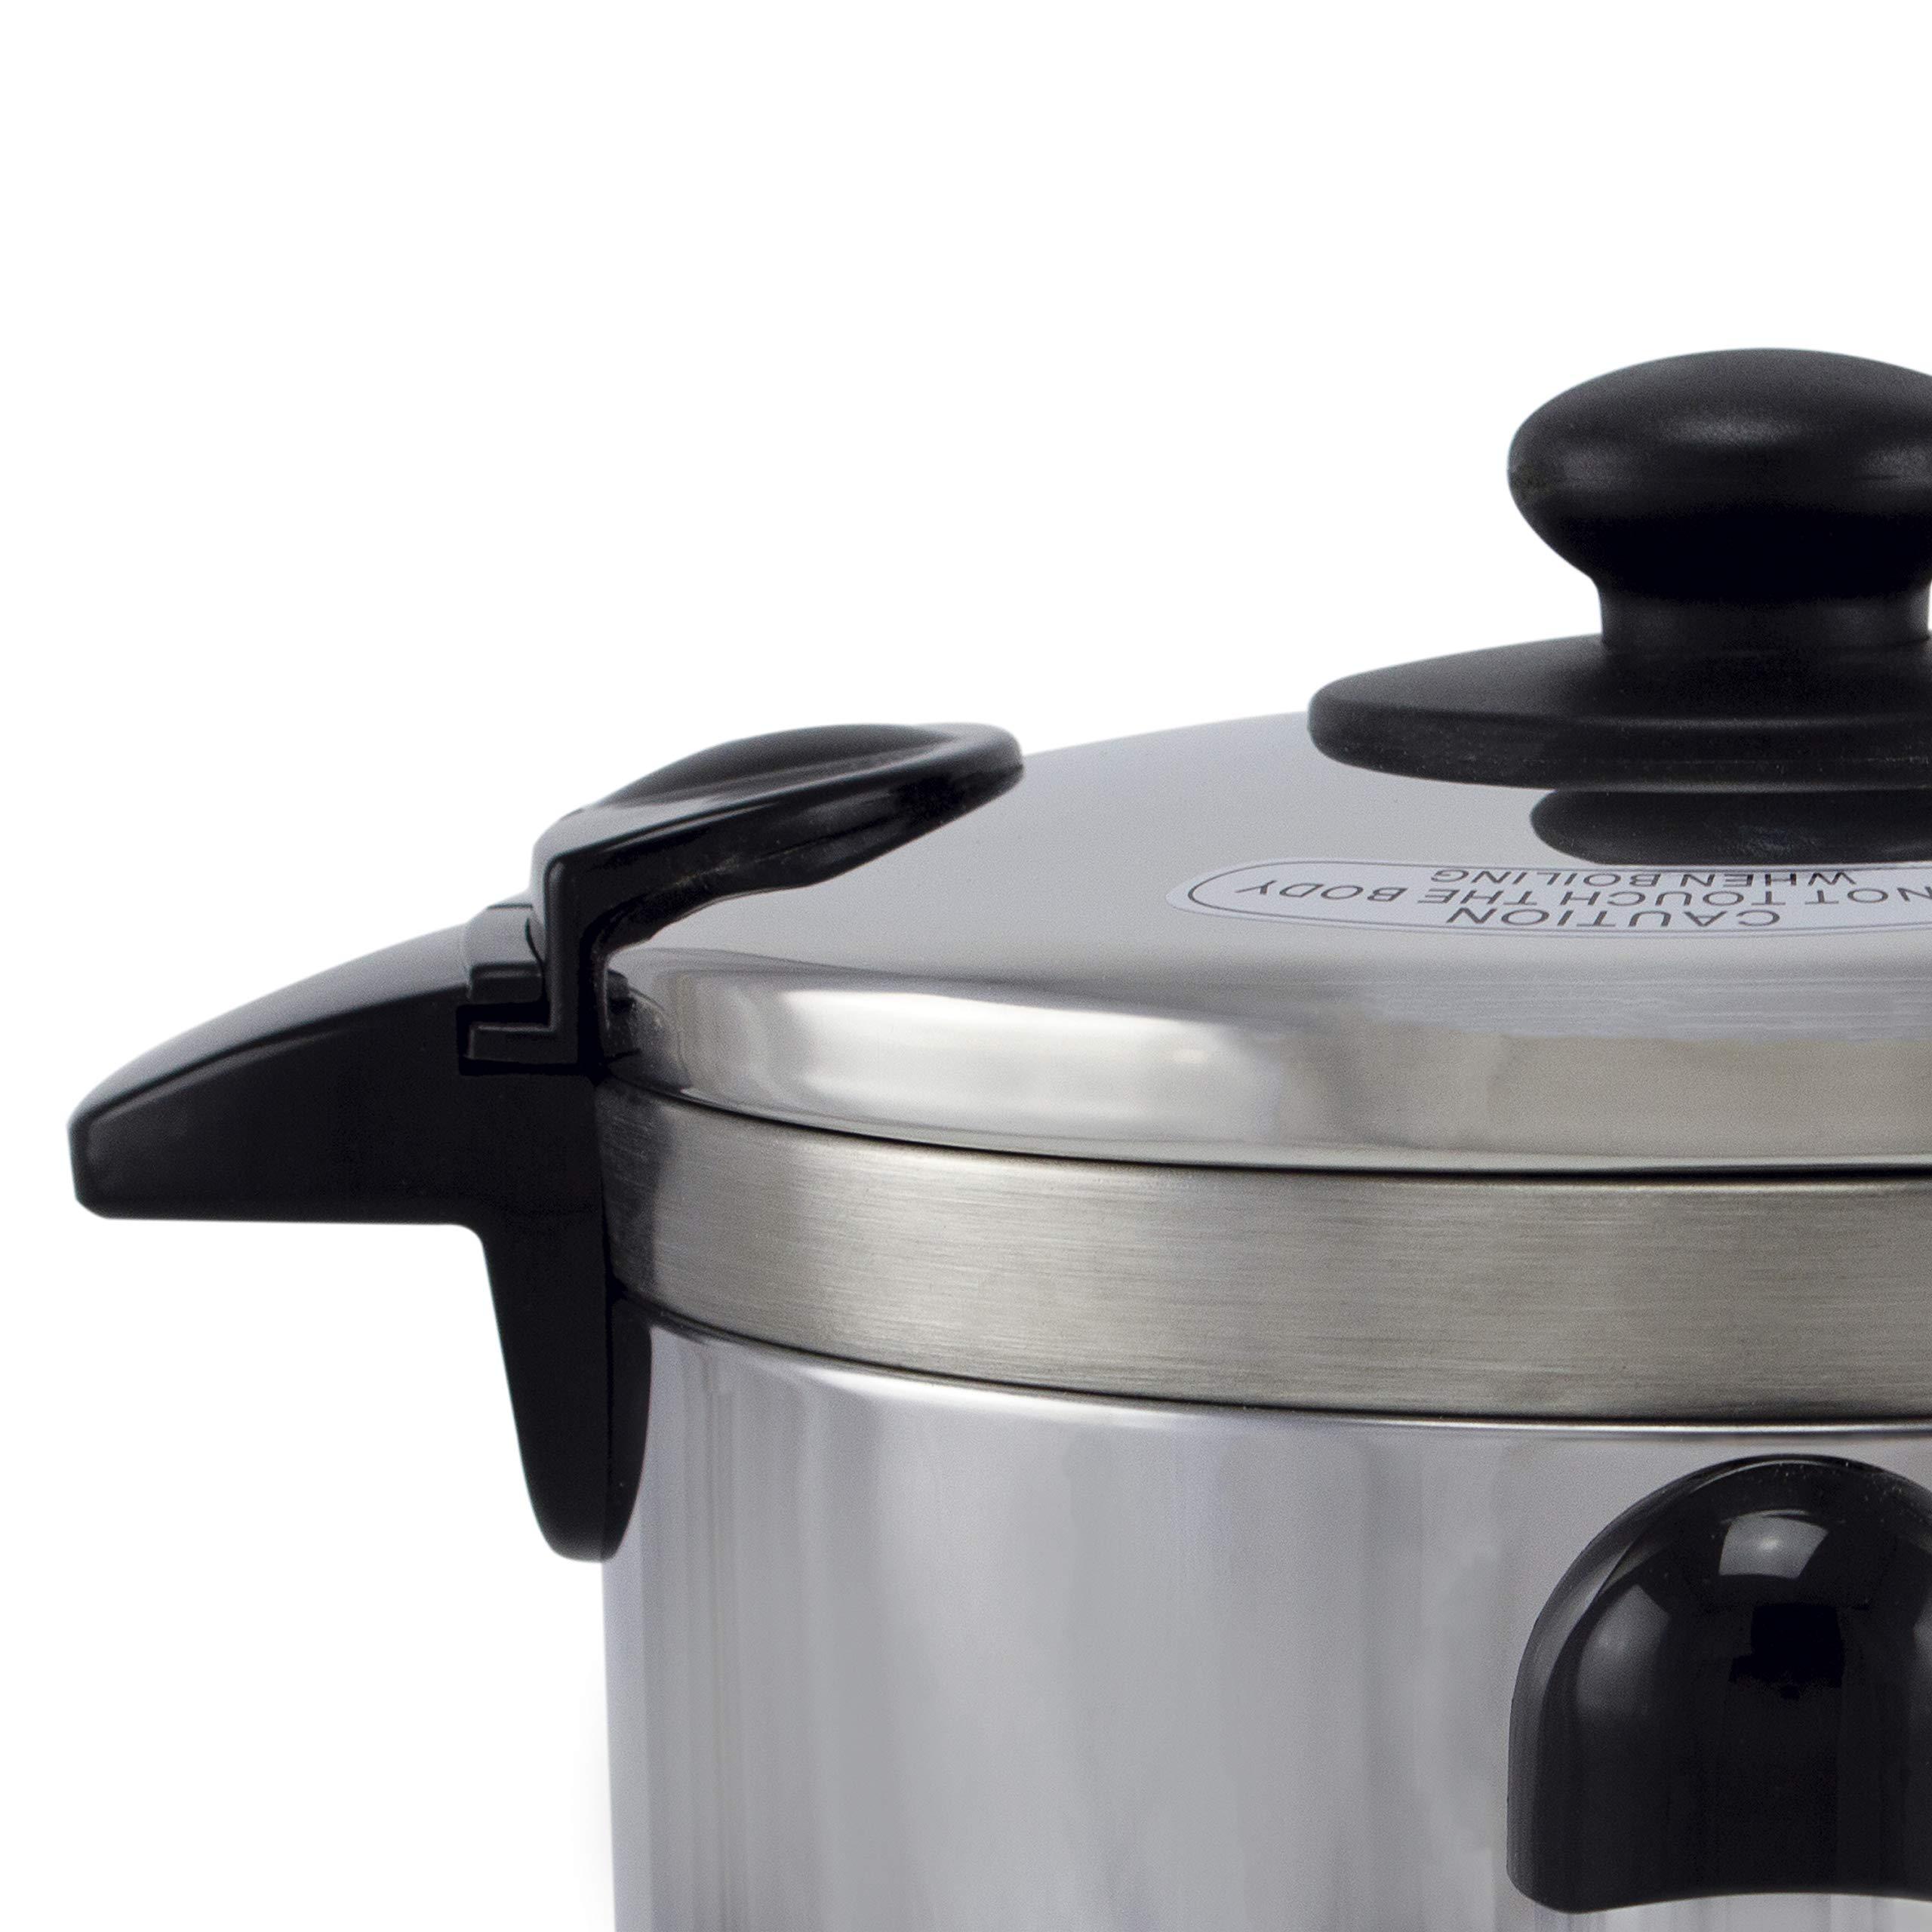 Nesco CU-30 Professional Coffee Urn Stainless Steel by Nesco (Image #8)